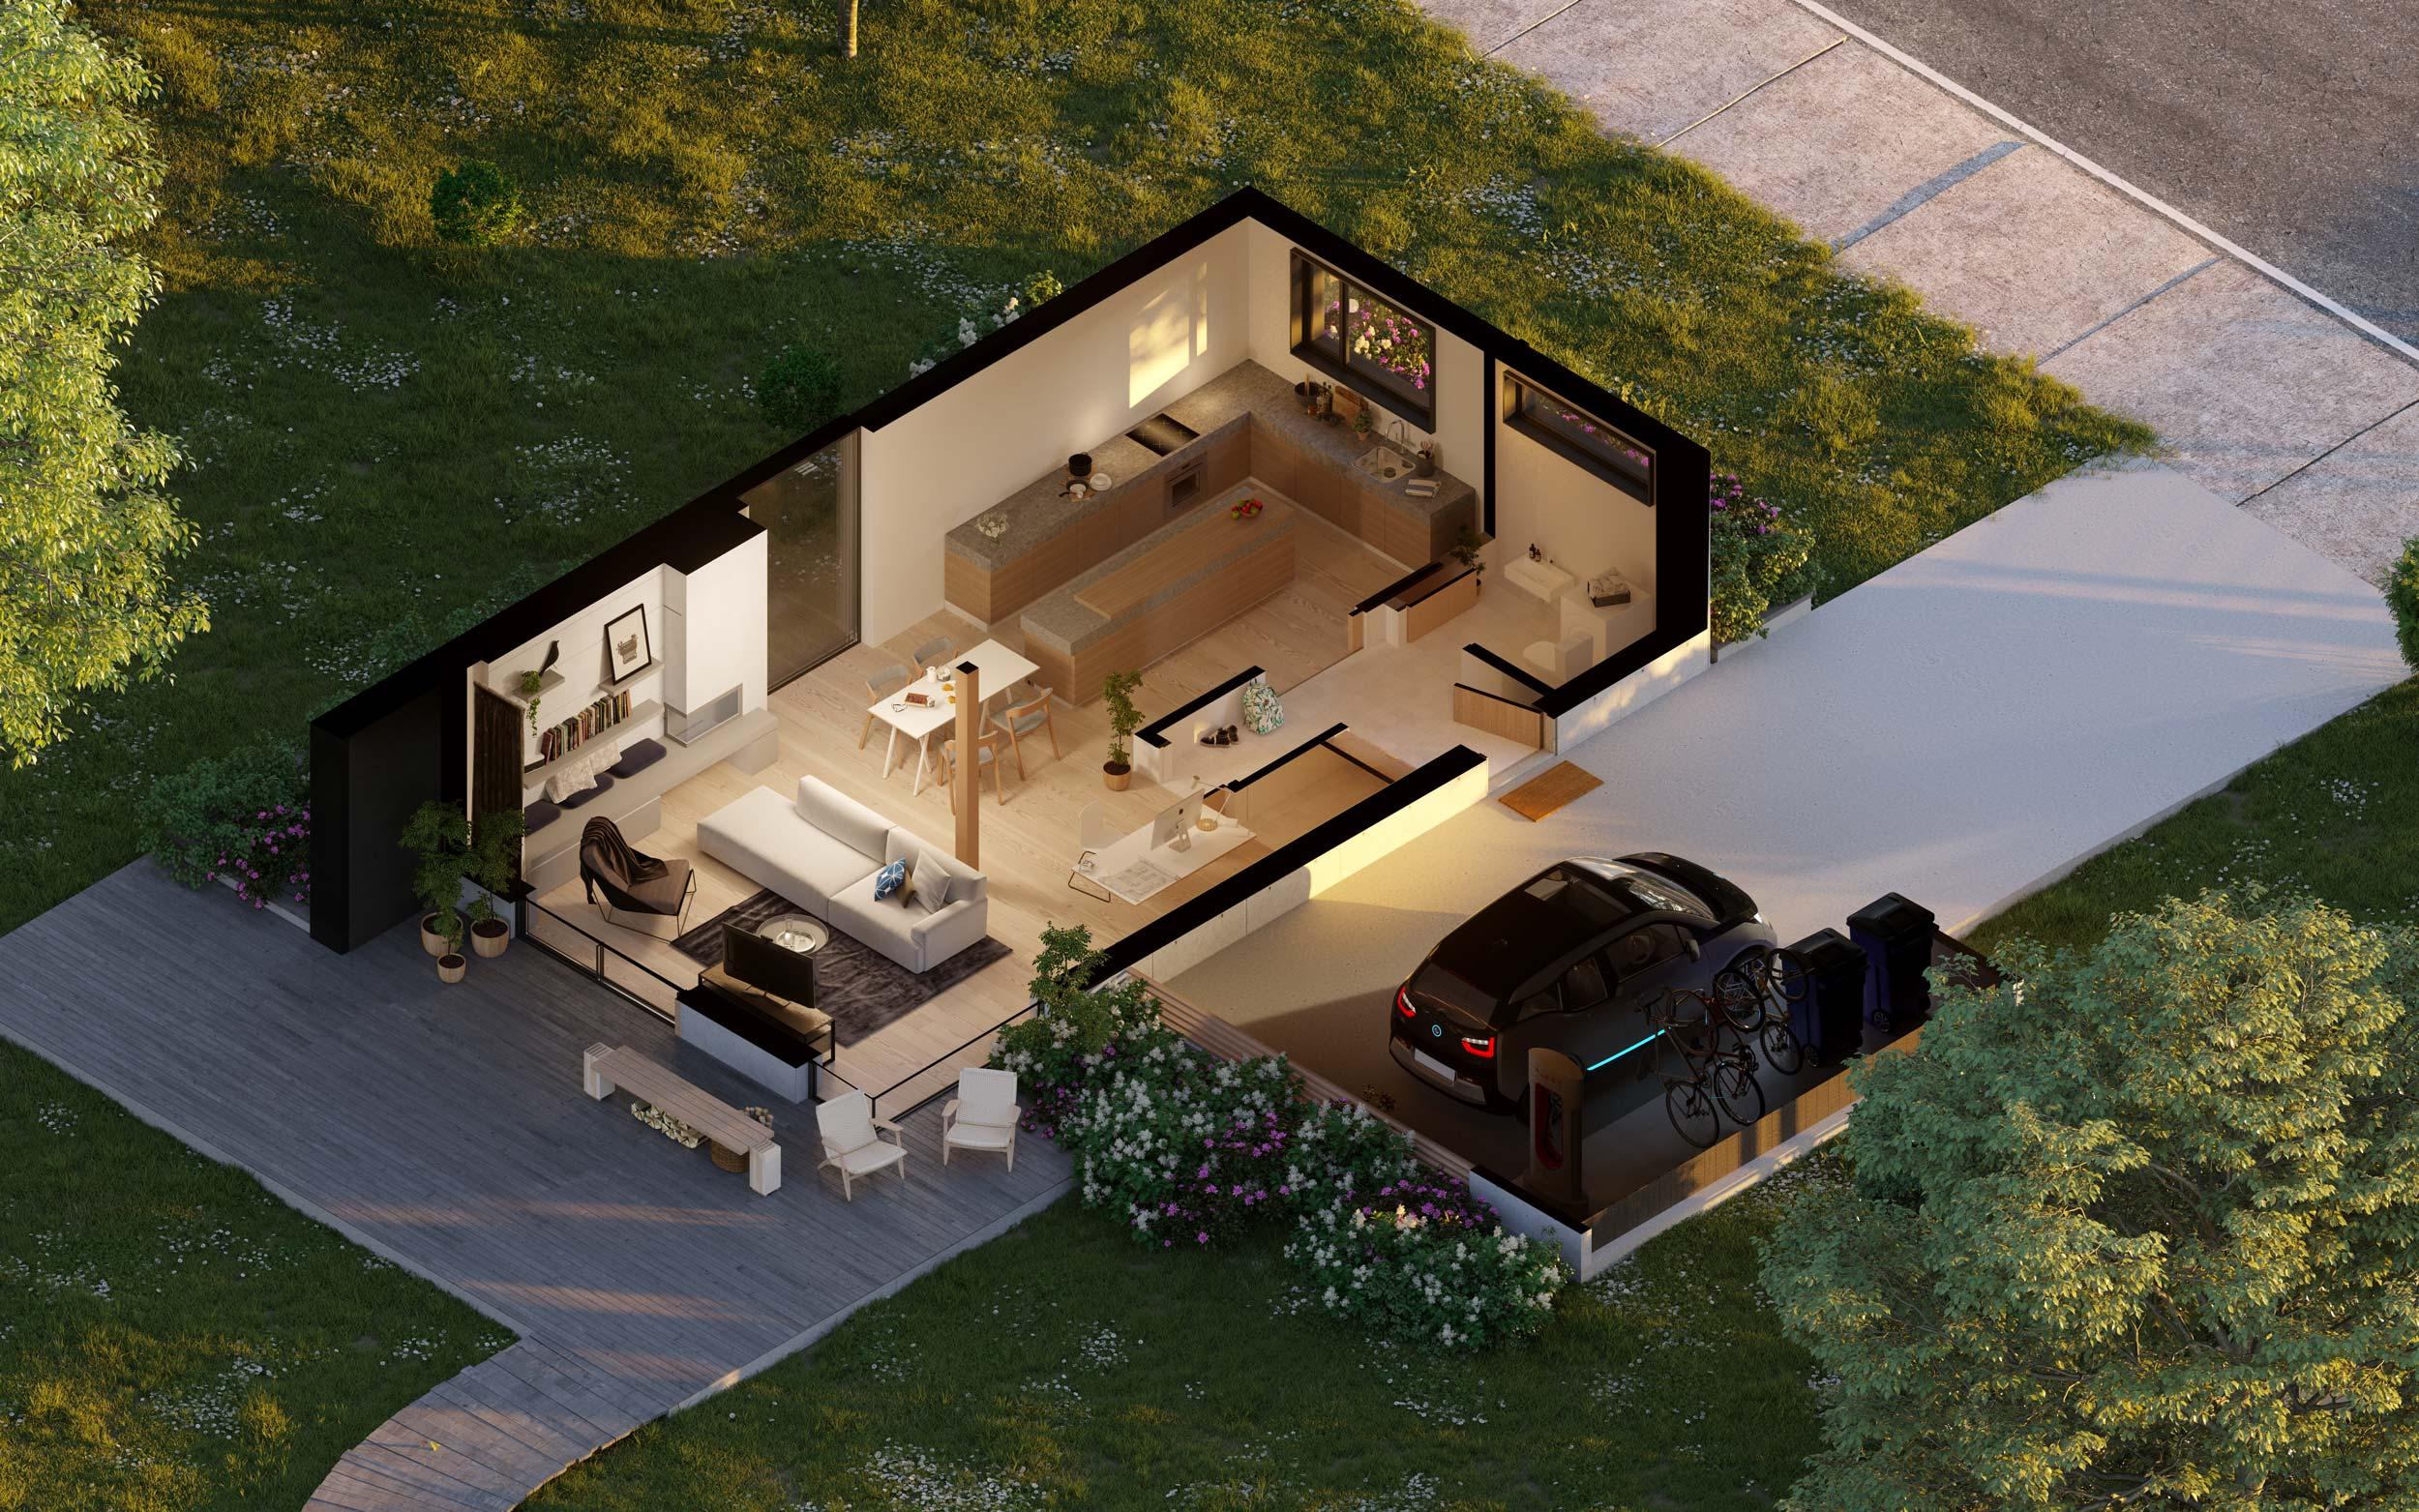 Alex-Kaiser-Different-Ground-Floor-plan-visualisaiton-CGI-London-05.jpg